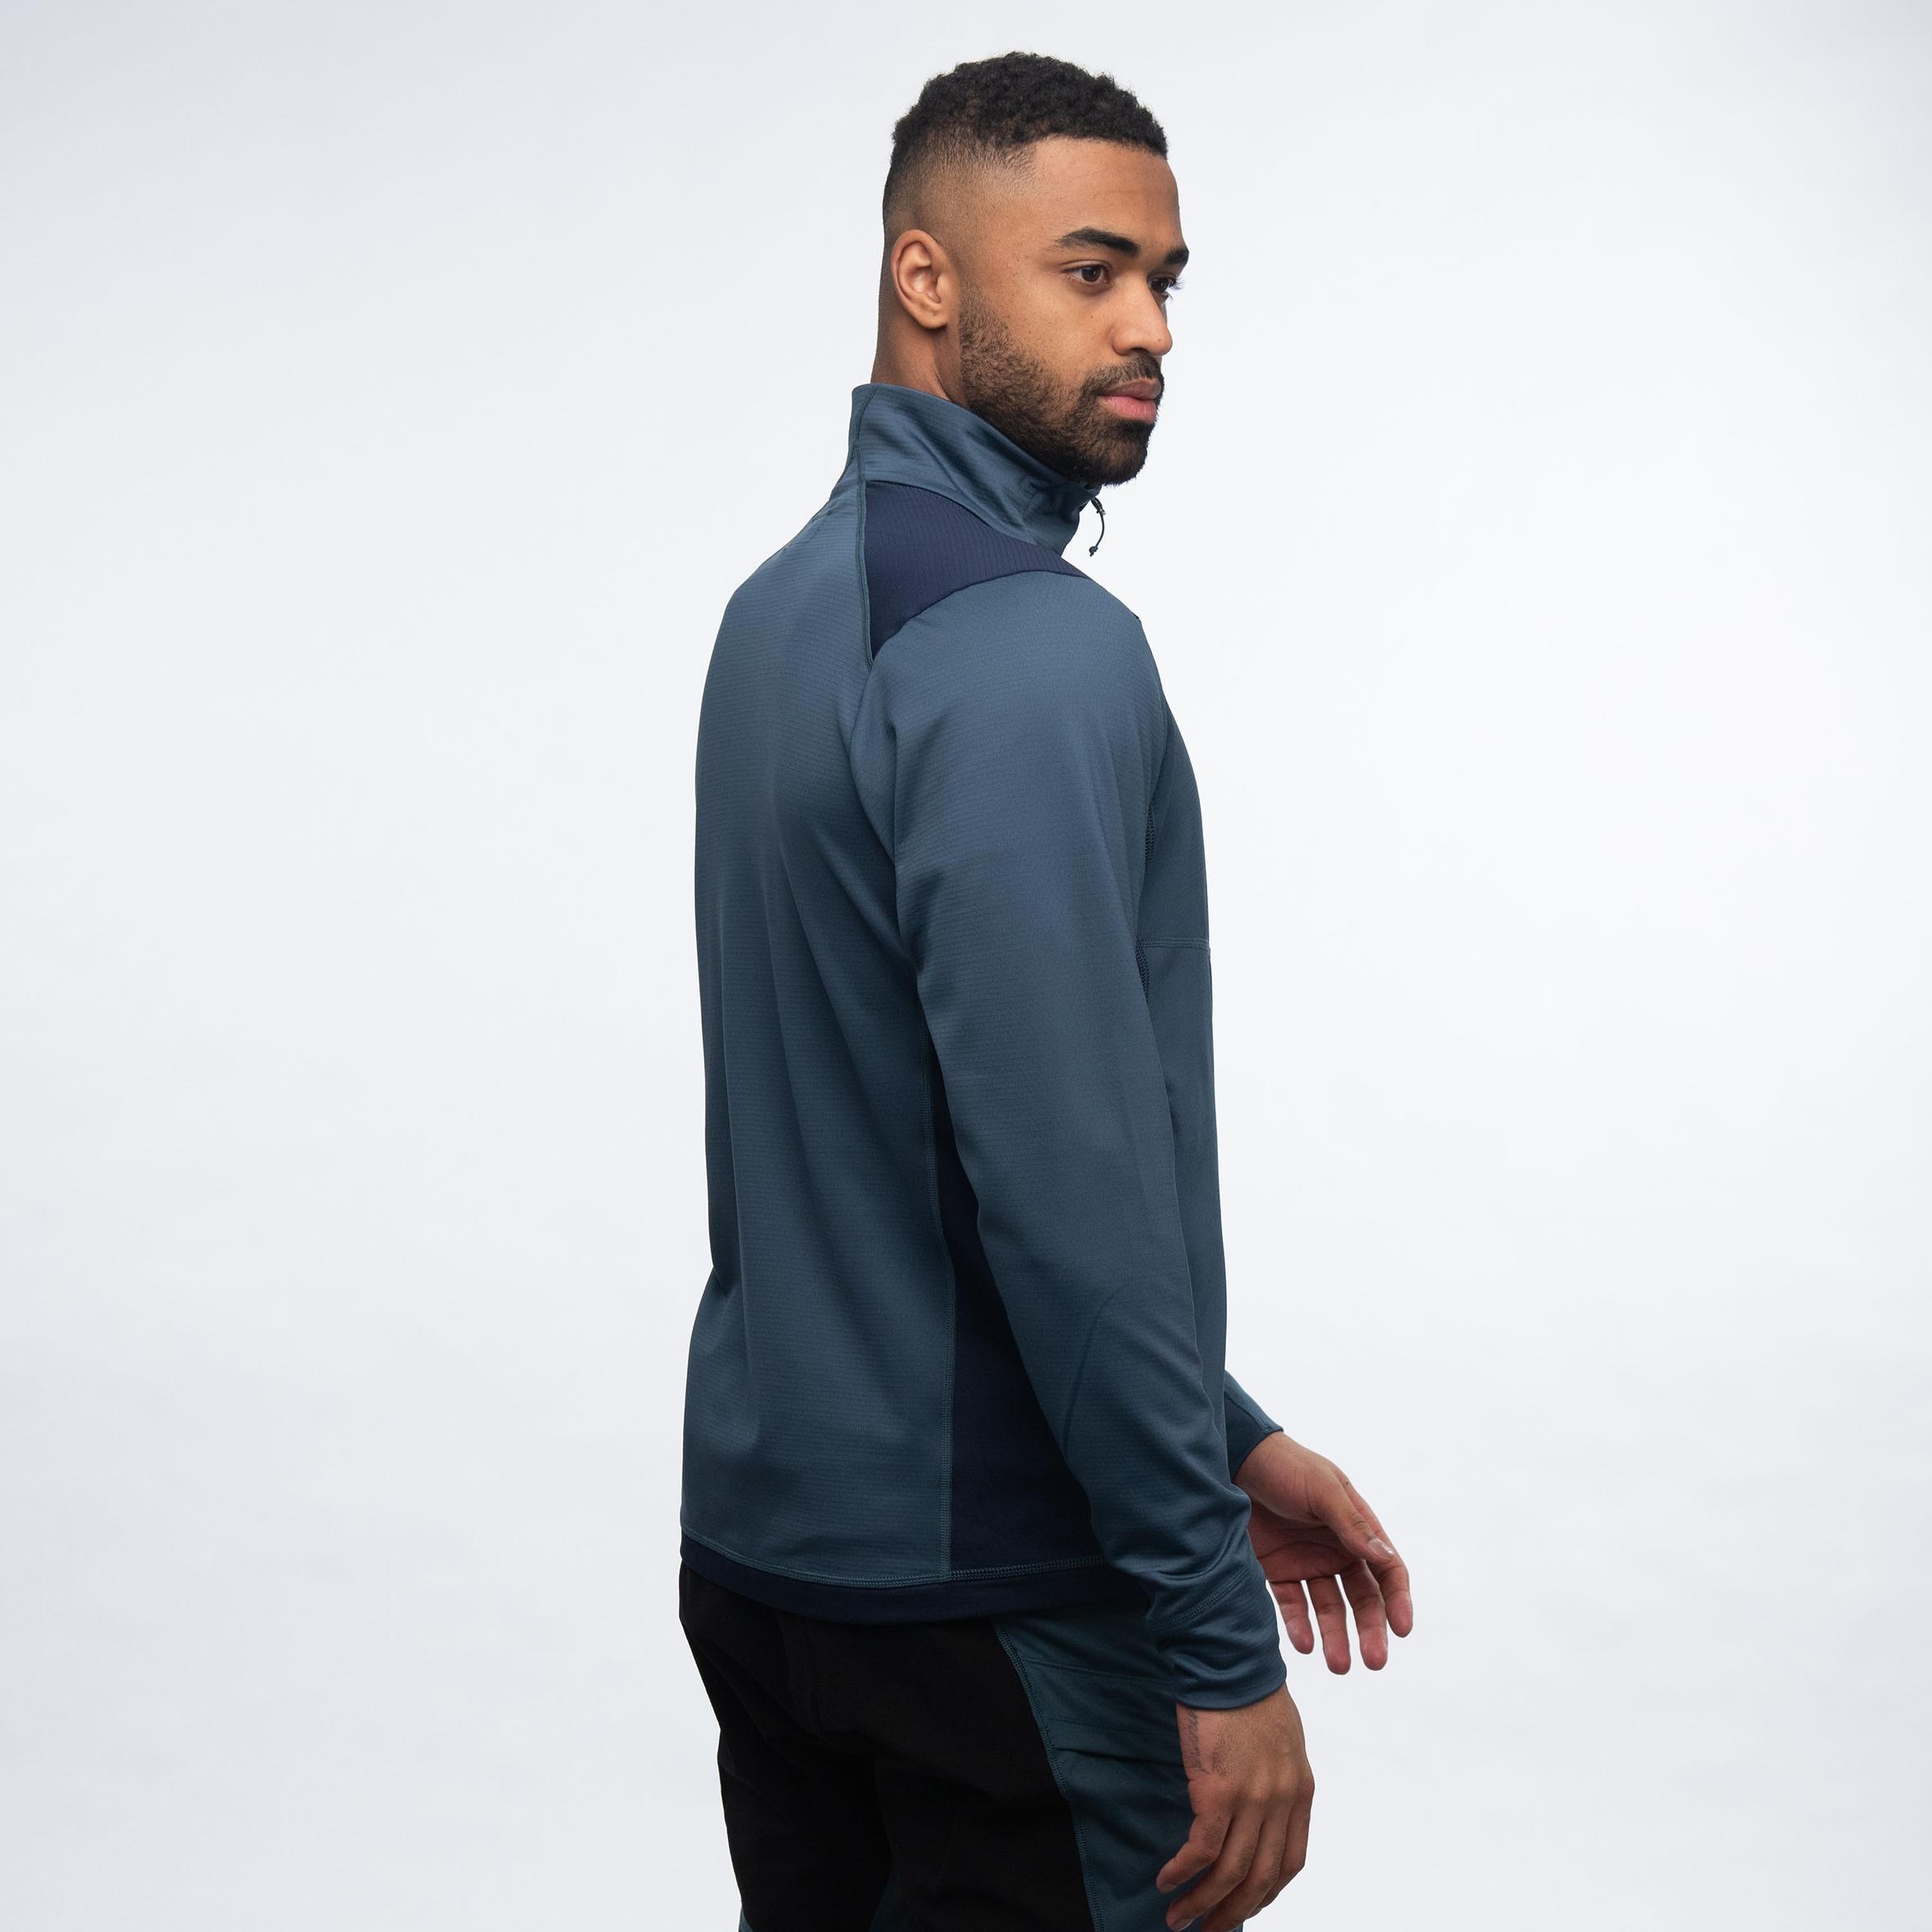 Skaland Jacket